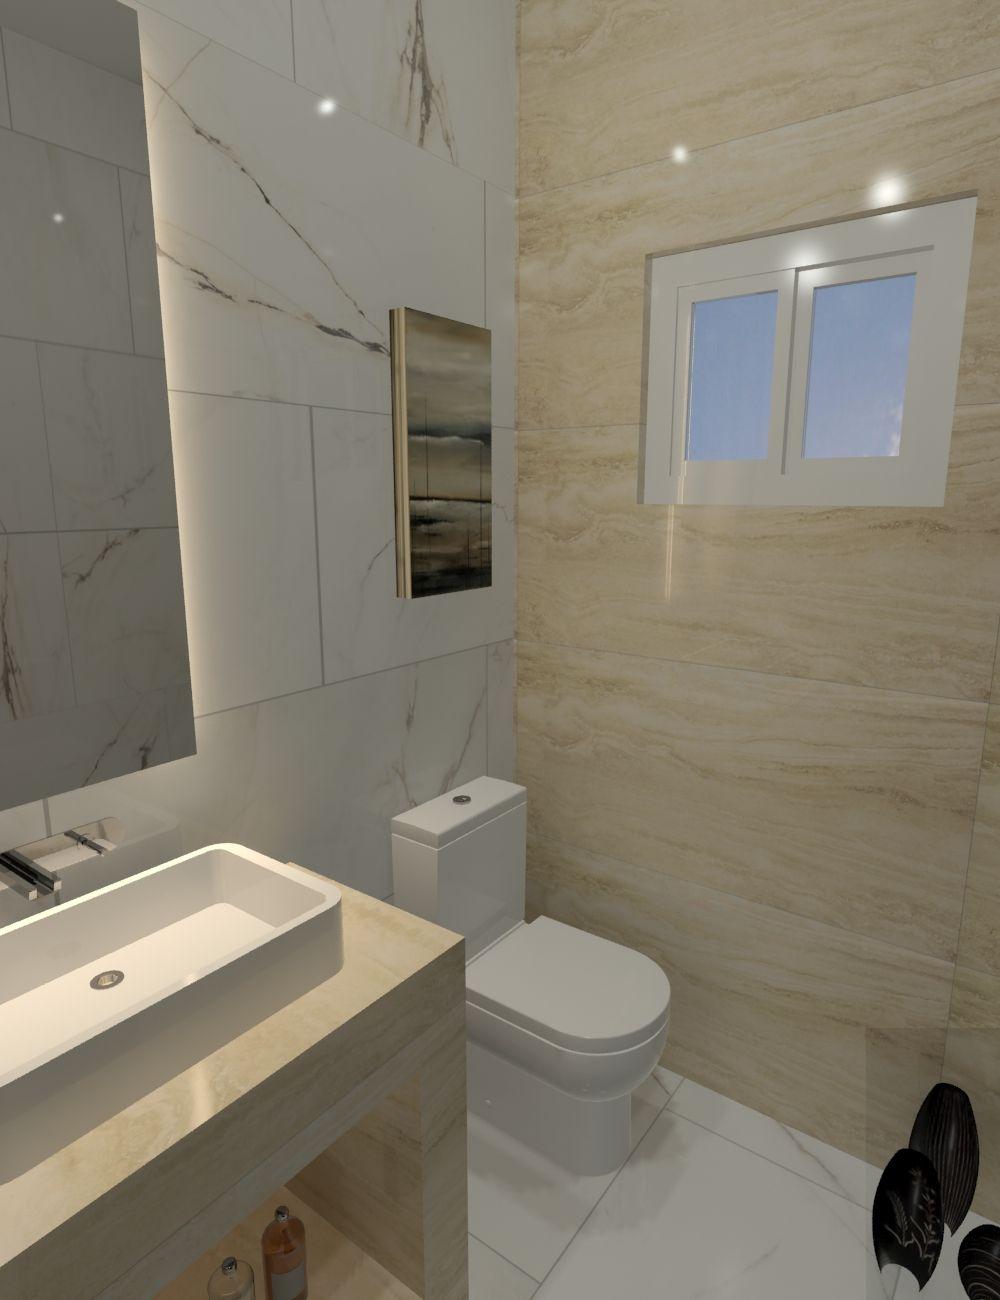 Piso y muros paonazzetto bianco portobello muro ventana - Marmol travertino blanco ...